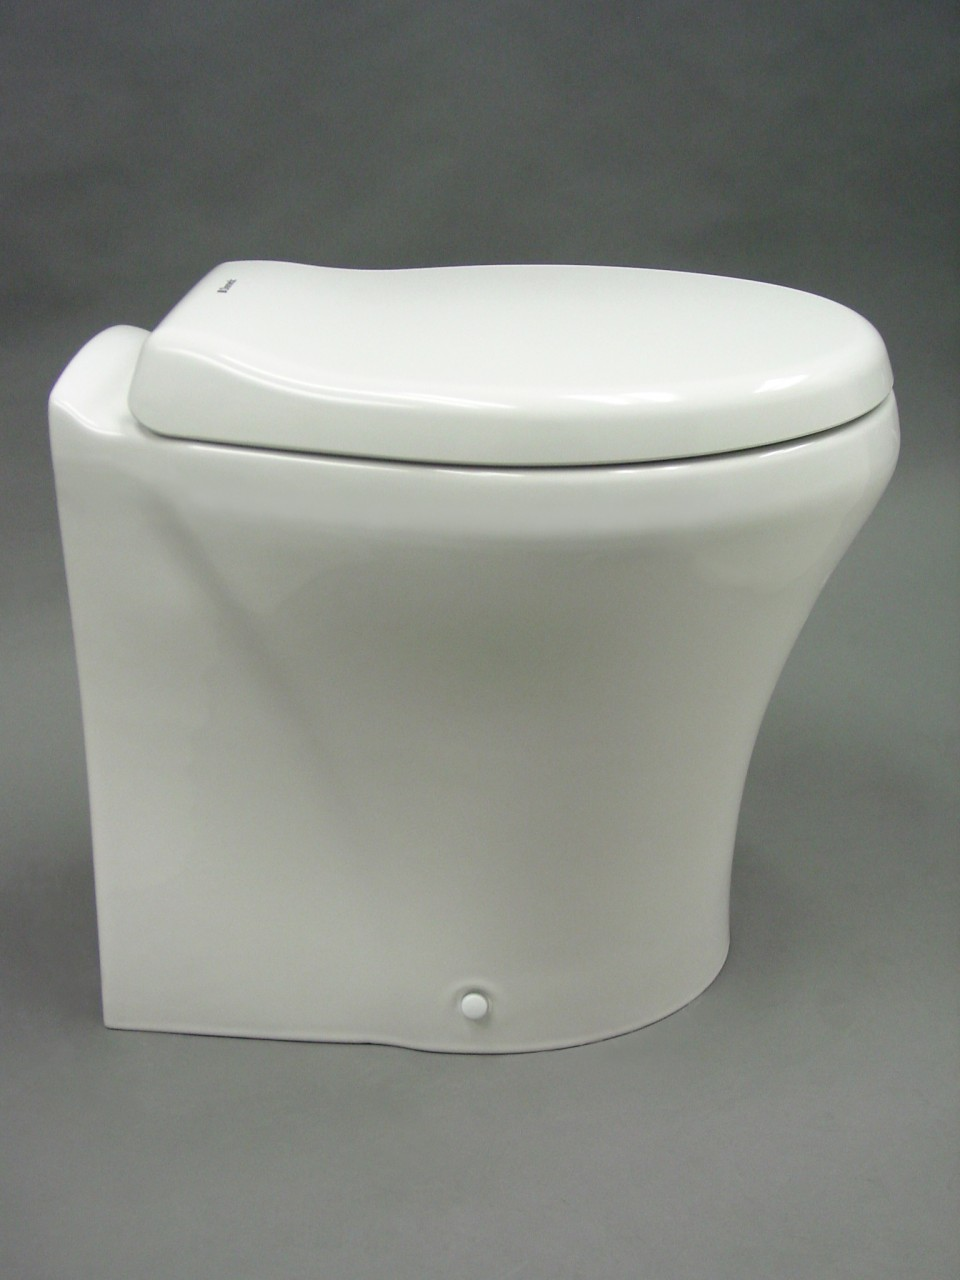 Dometic 304863901 Masterflush Macerator Toilet 8600 White   1,15000 Plus Frtease Call For Frt Quote